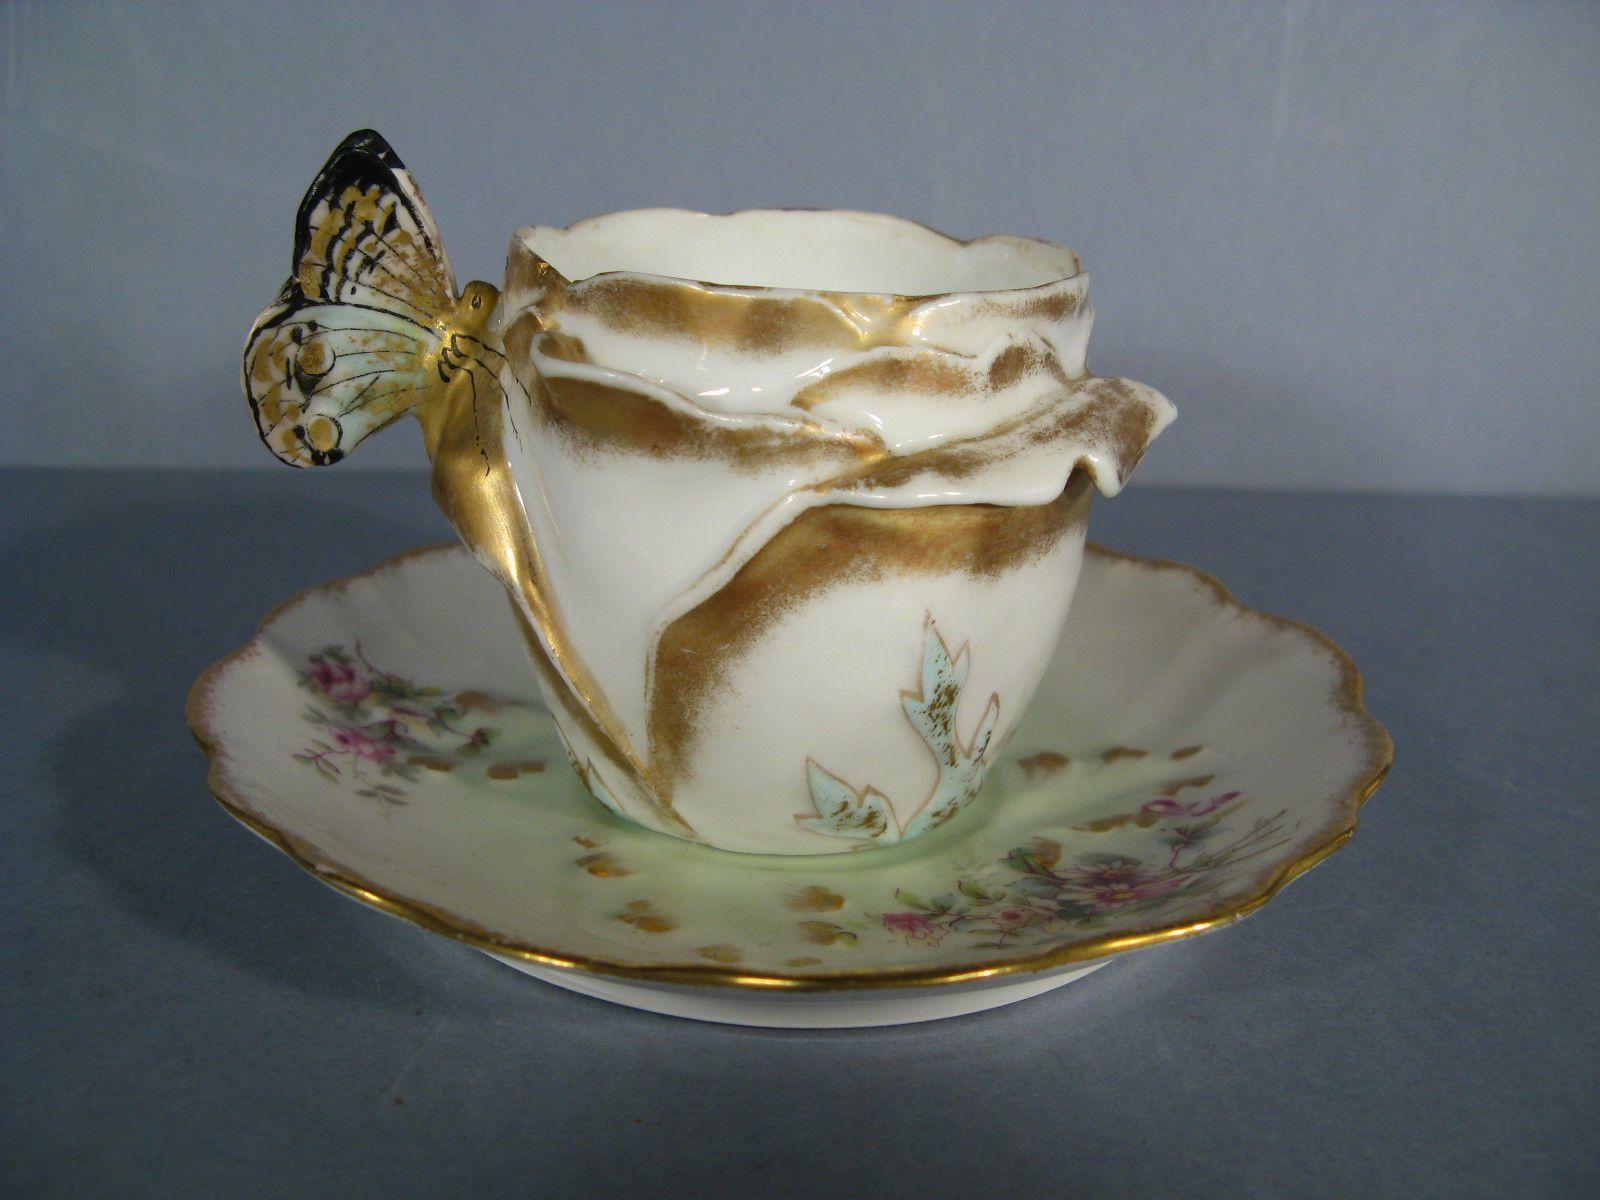 tasse papillon porcelaine de limoges style art nouveau tasse porcelaine limoges porcelaine. Black Bedroom Furniture Sets. Home Design Ideas